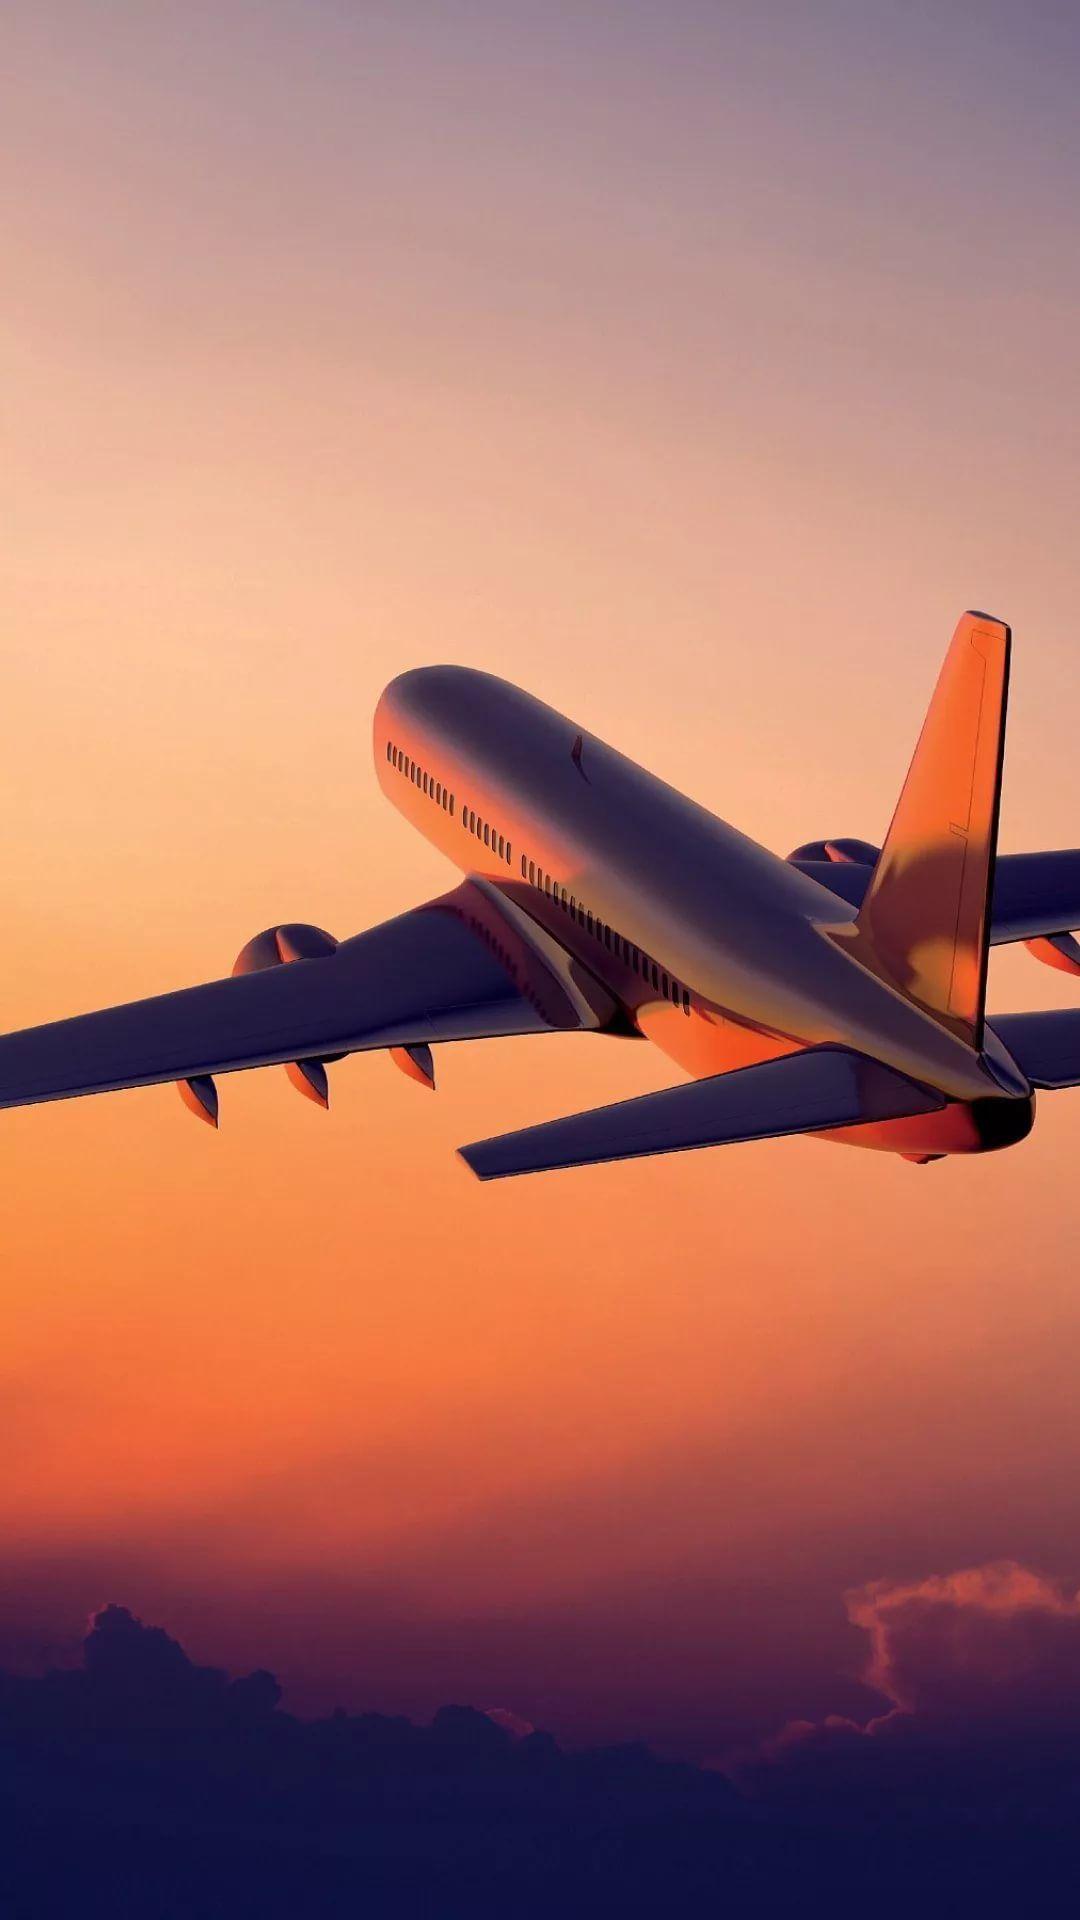 Airplane Apple iPhone wallpaper